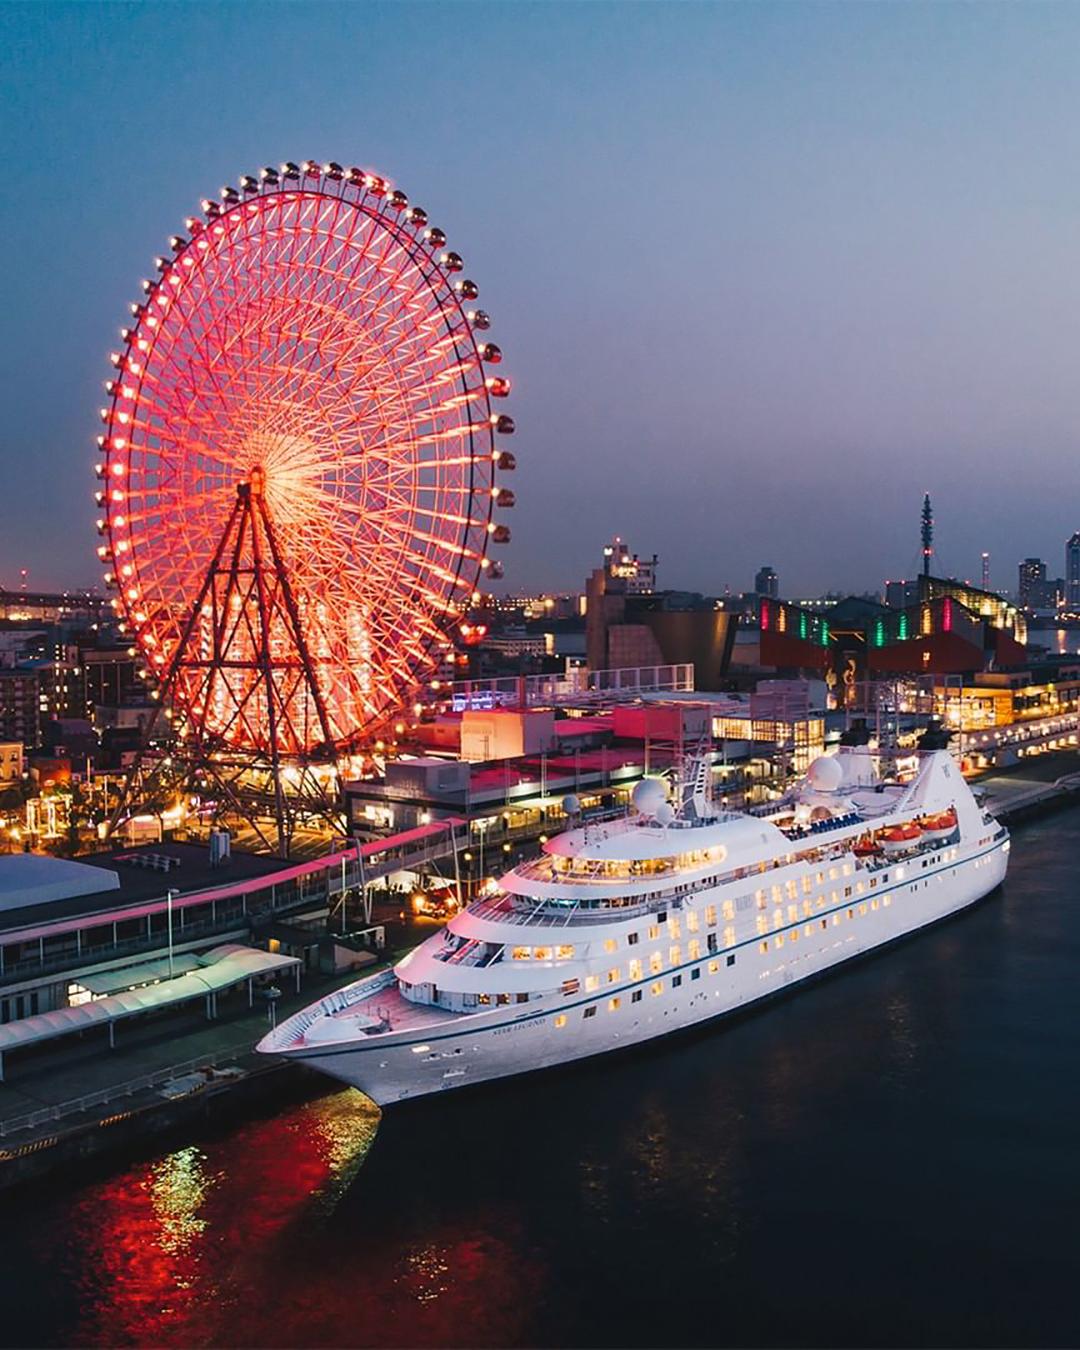 Social Media-IG-Windstar-Ferris-Wheel-1080x1350